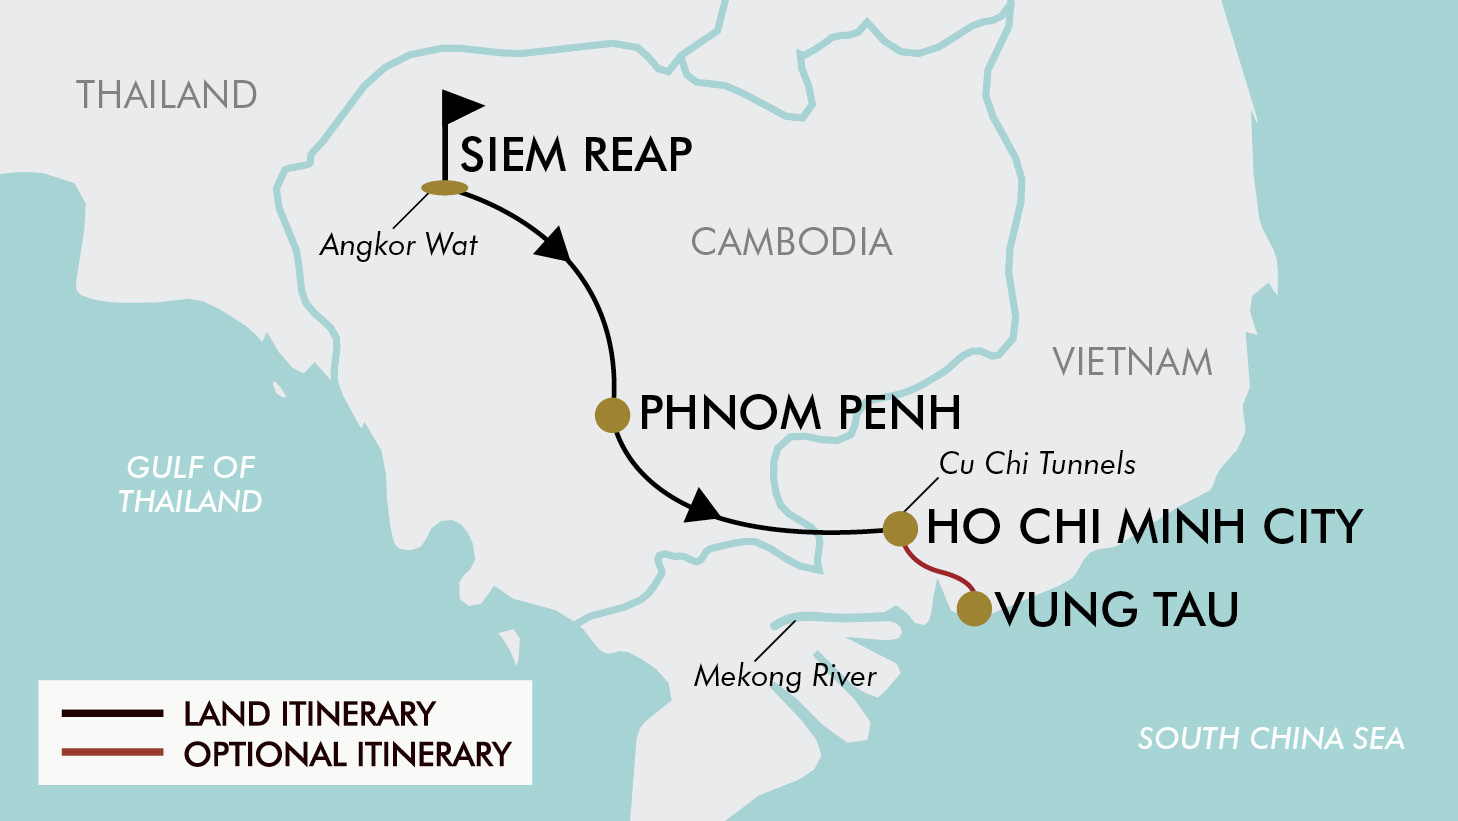 10 Day 2 For 1 Cambodia Vietnam Tripadeal